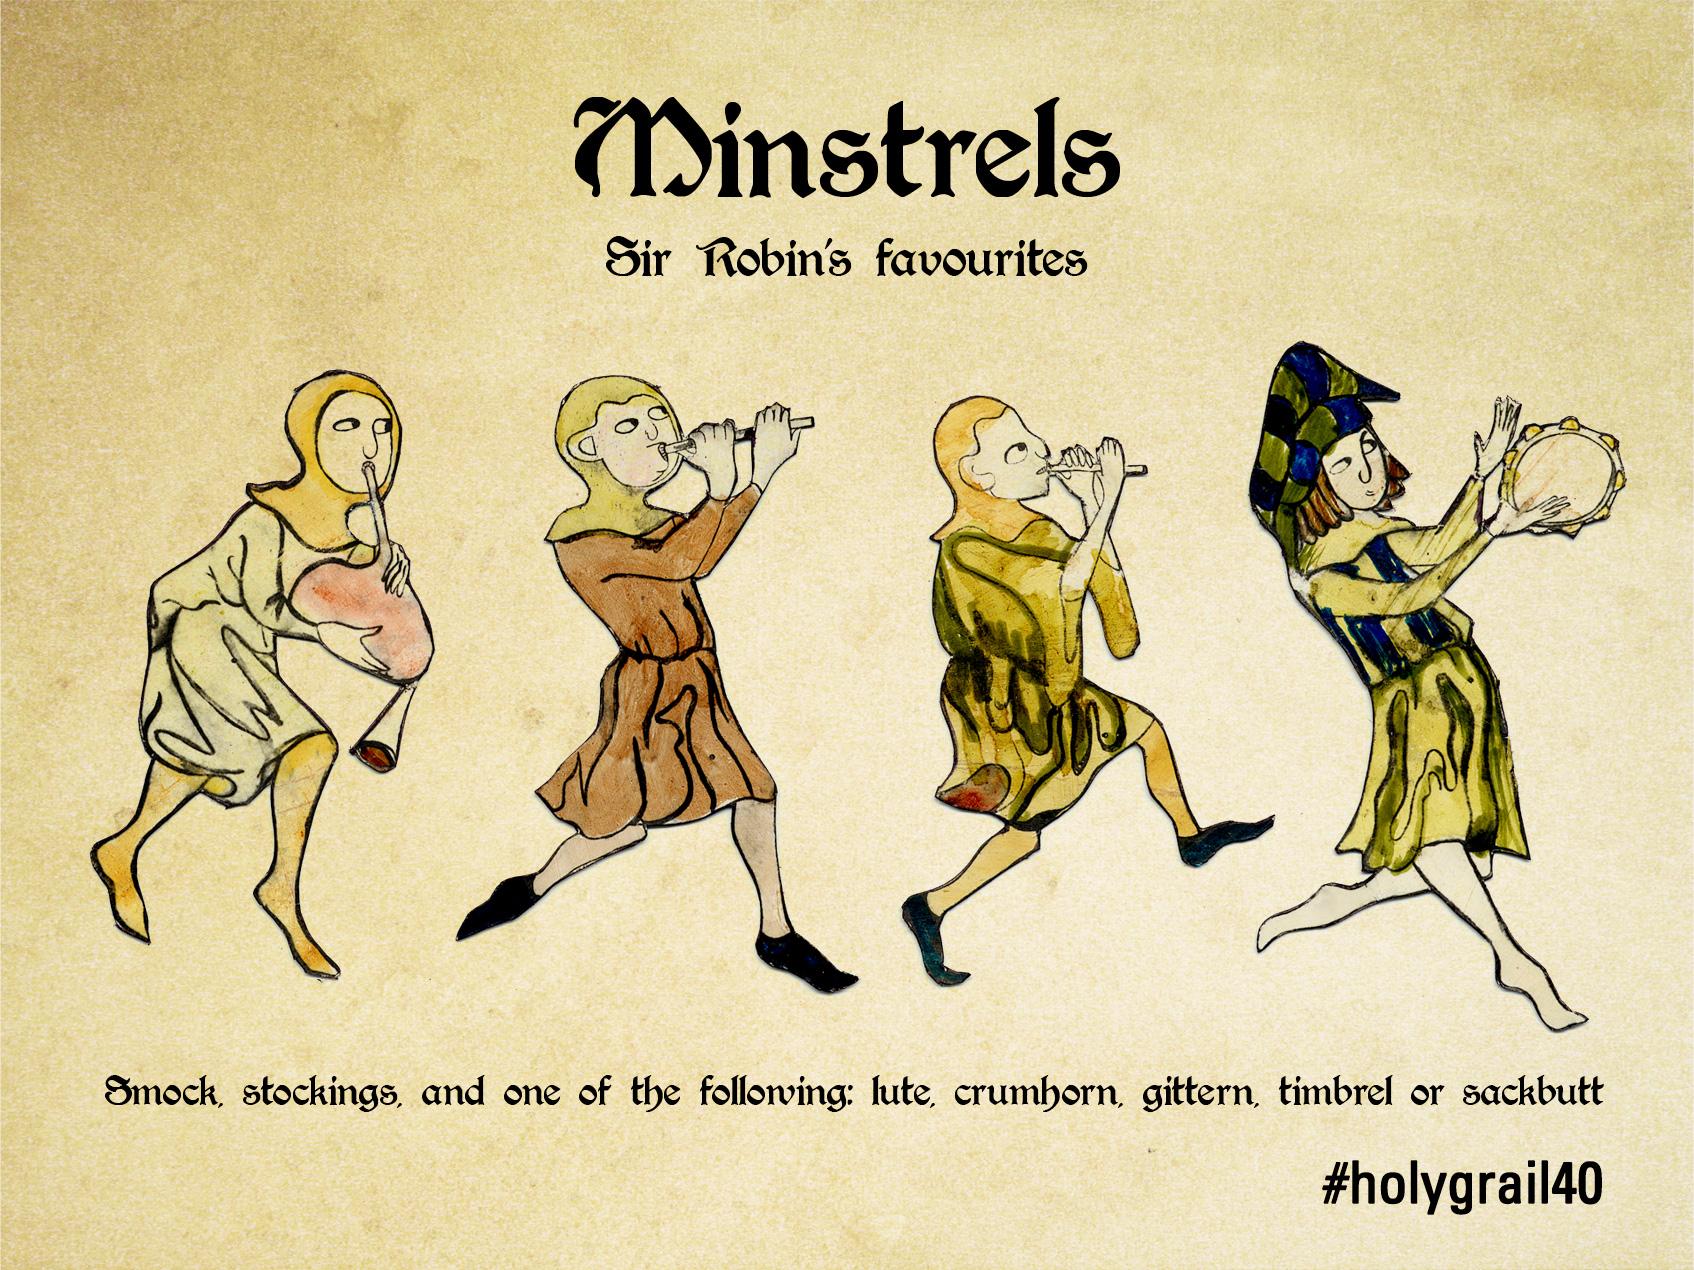 General_FOLDER_minstrels monty python official site pythonland